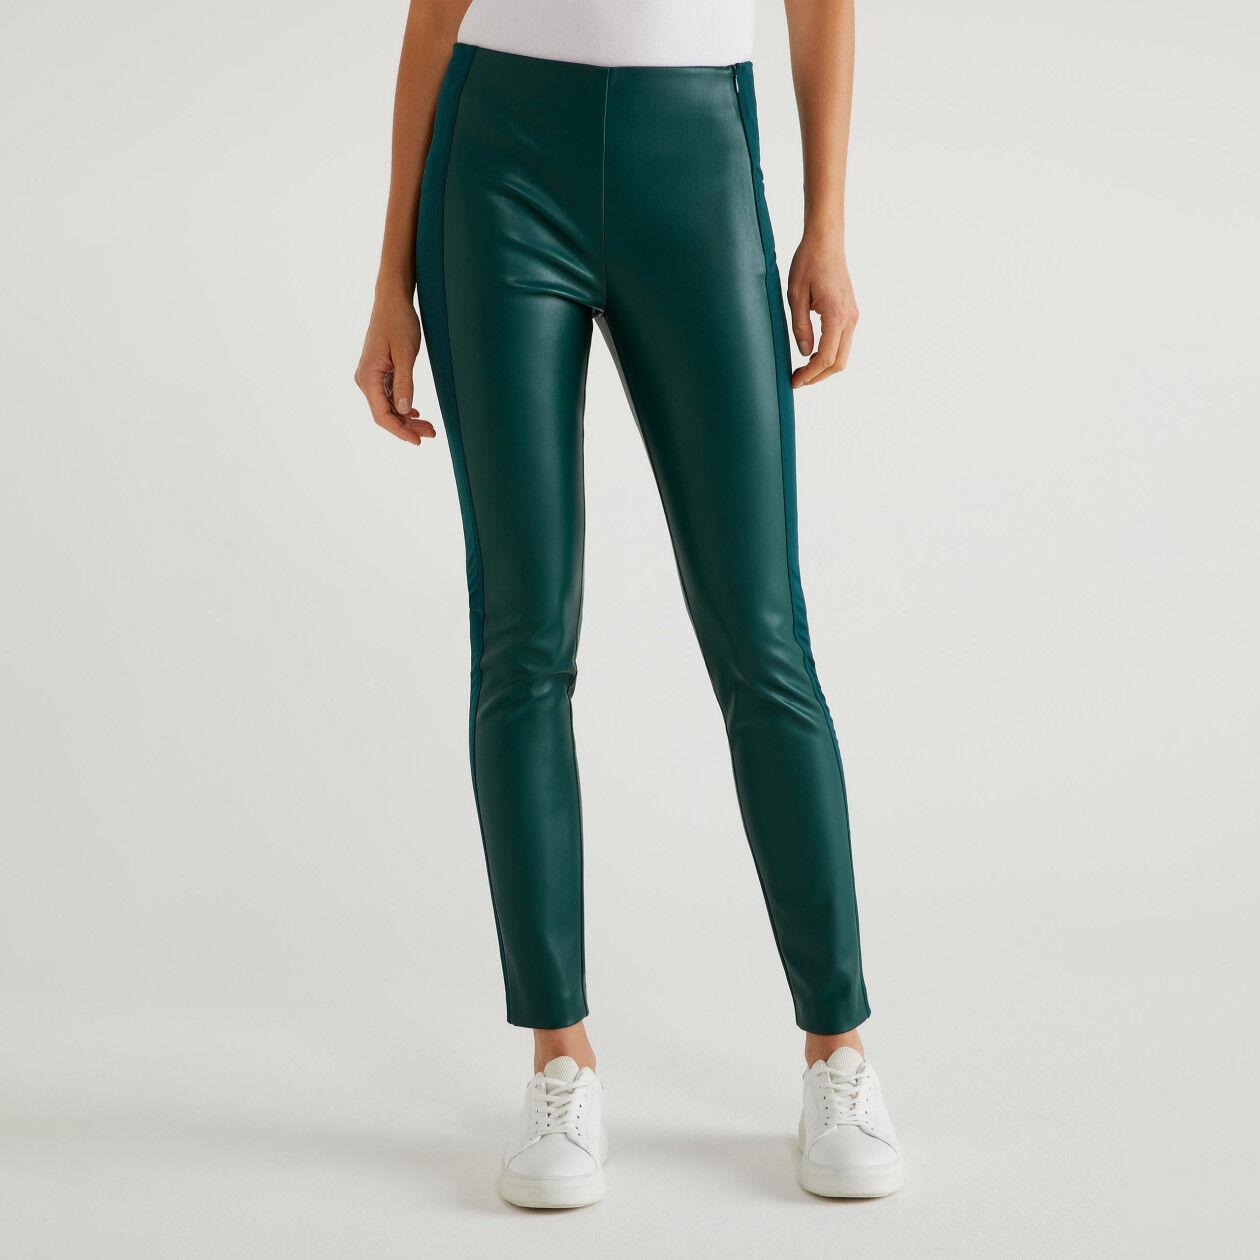 Pantaloni effetto pelle